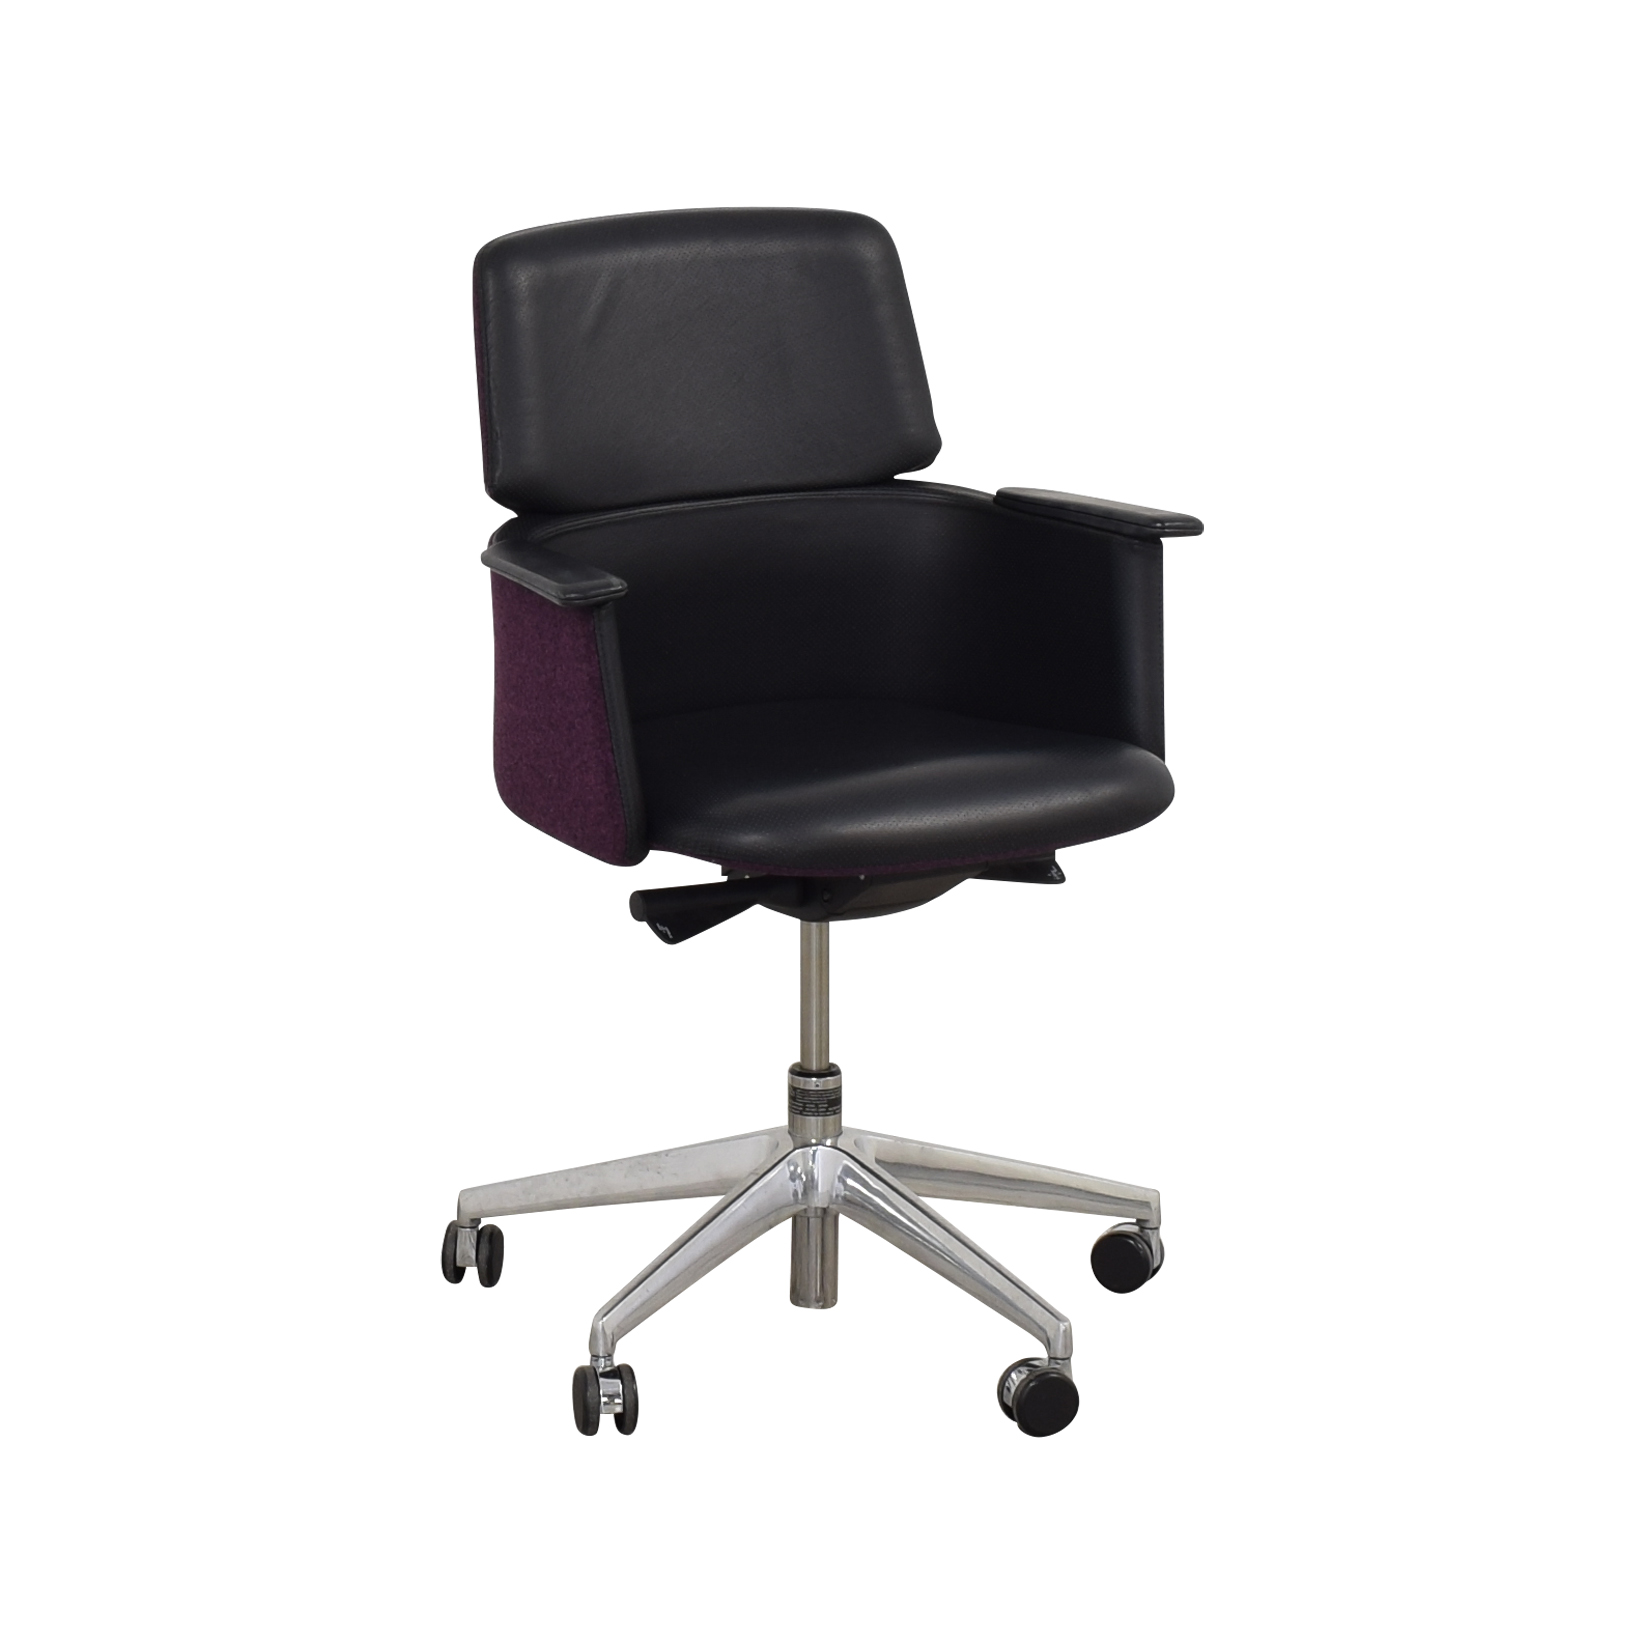 shop Koleksiyon Tola Task Chair Koleksiyon Chairs